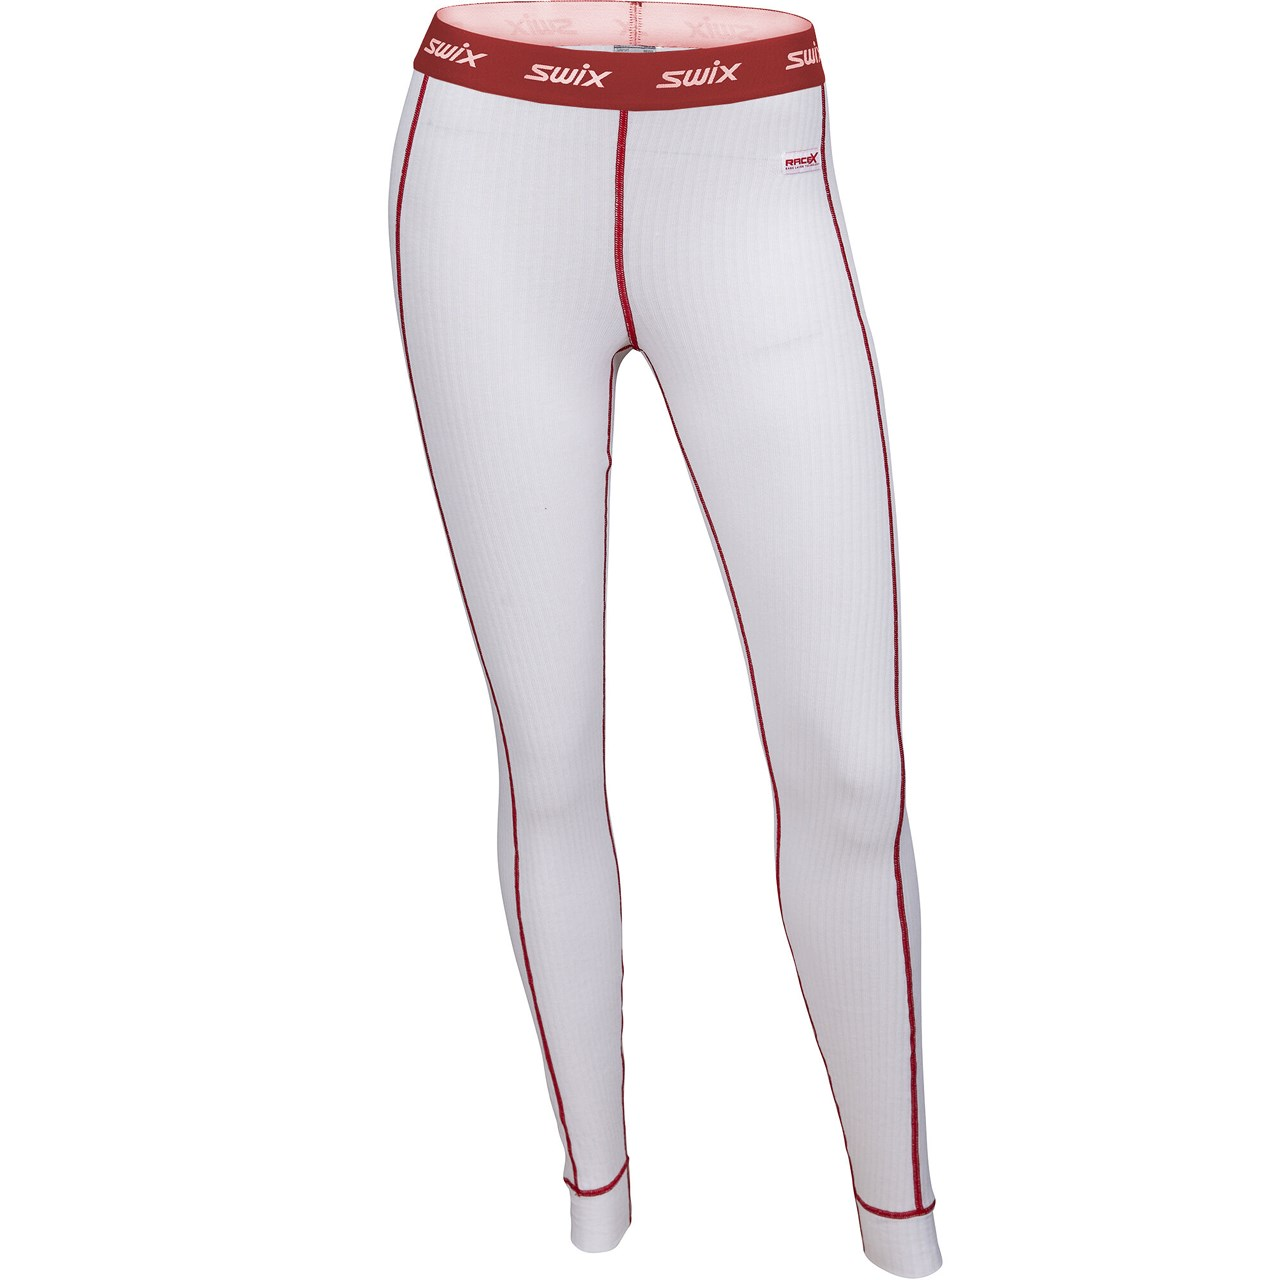 Race x bodywear pants W